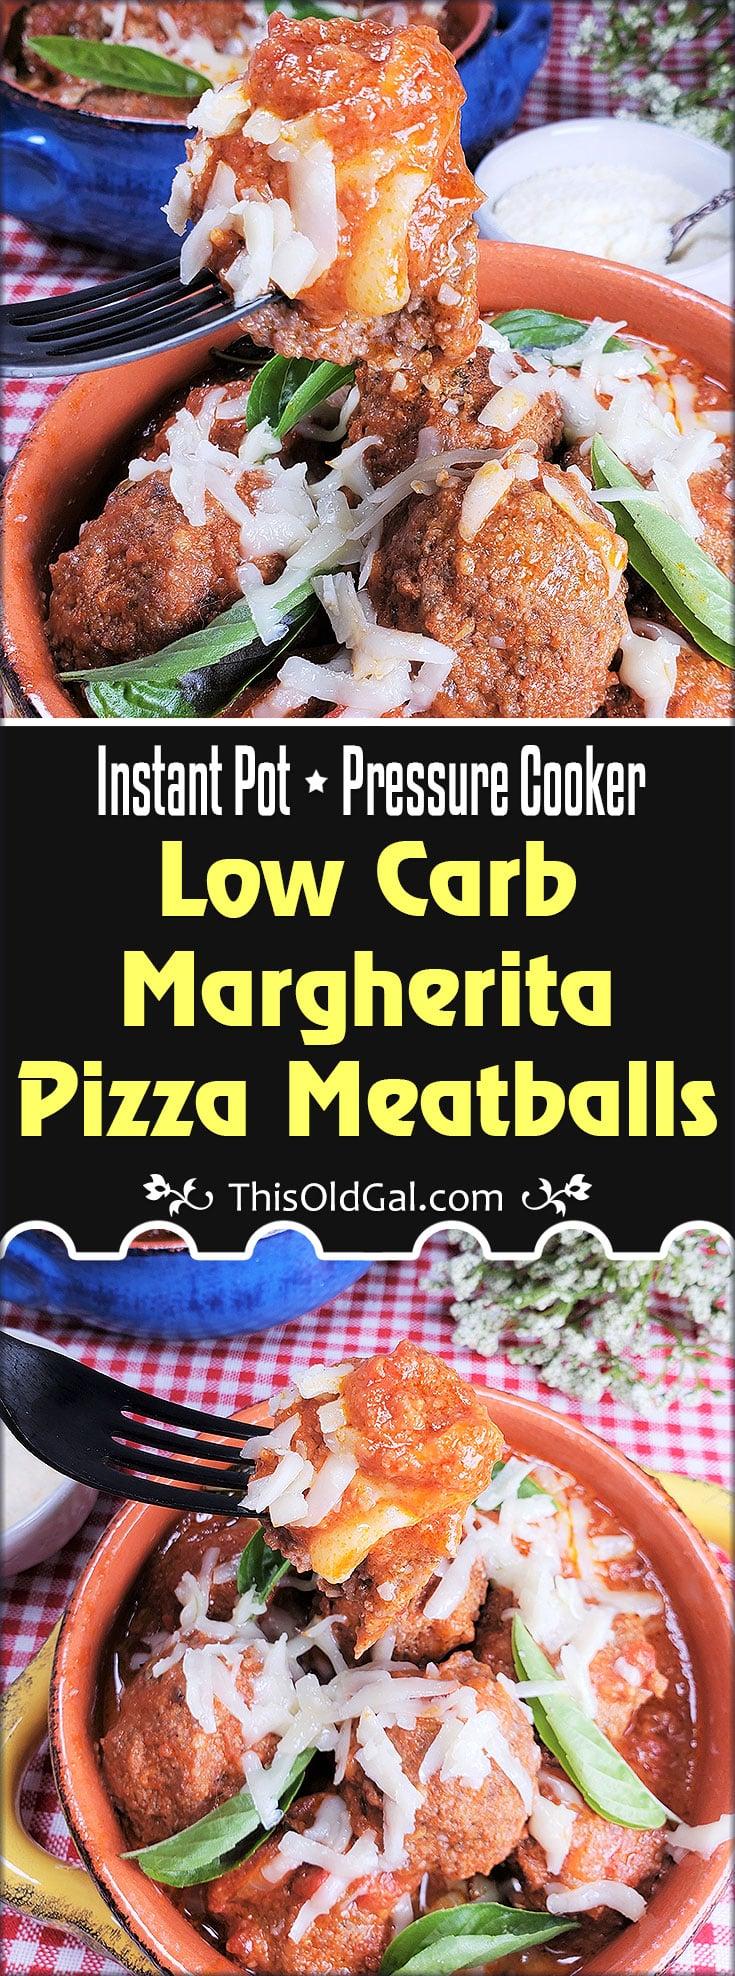 Instant Pot Keto Margherita Pizza Meatballs